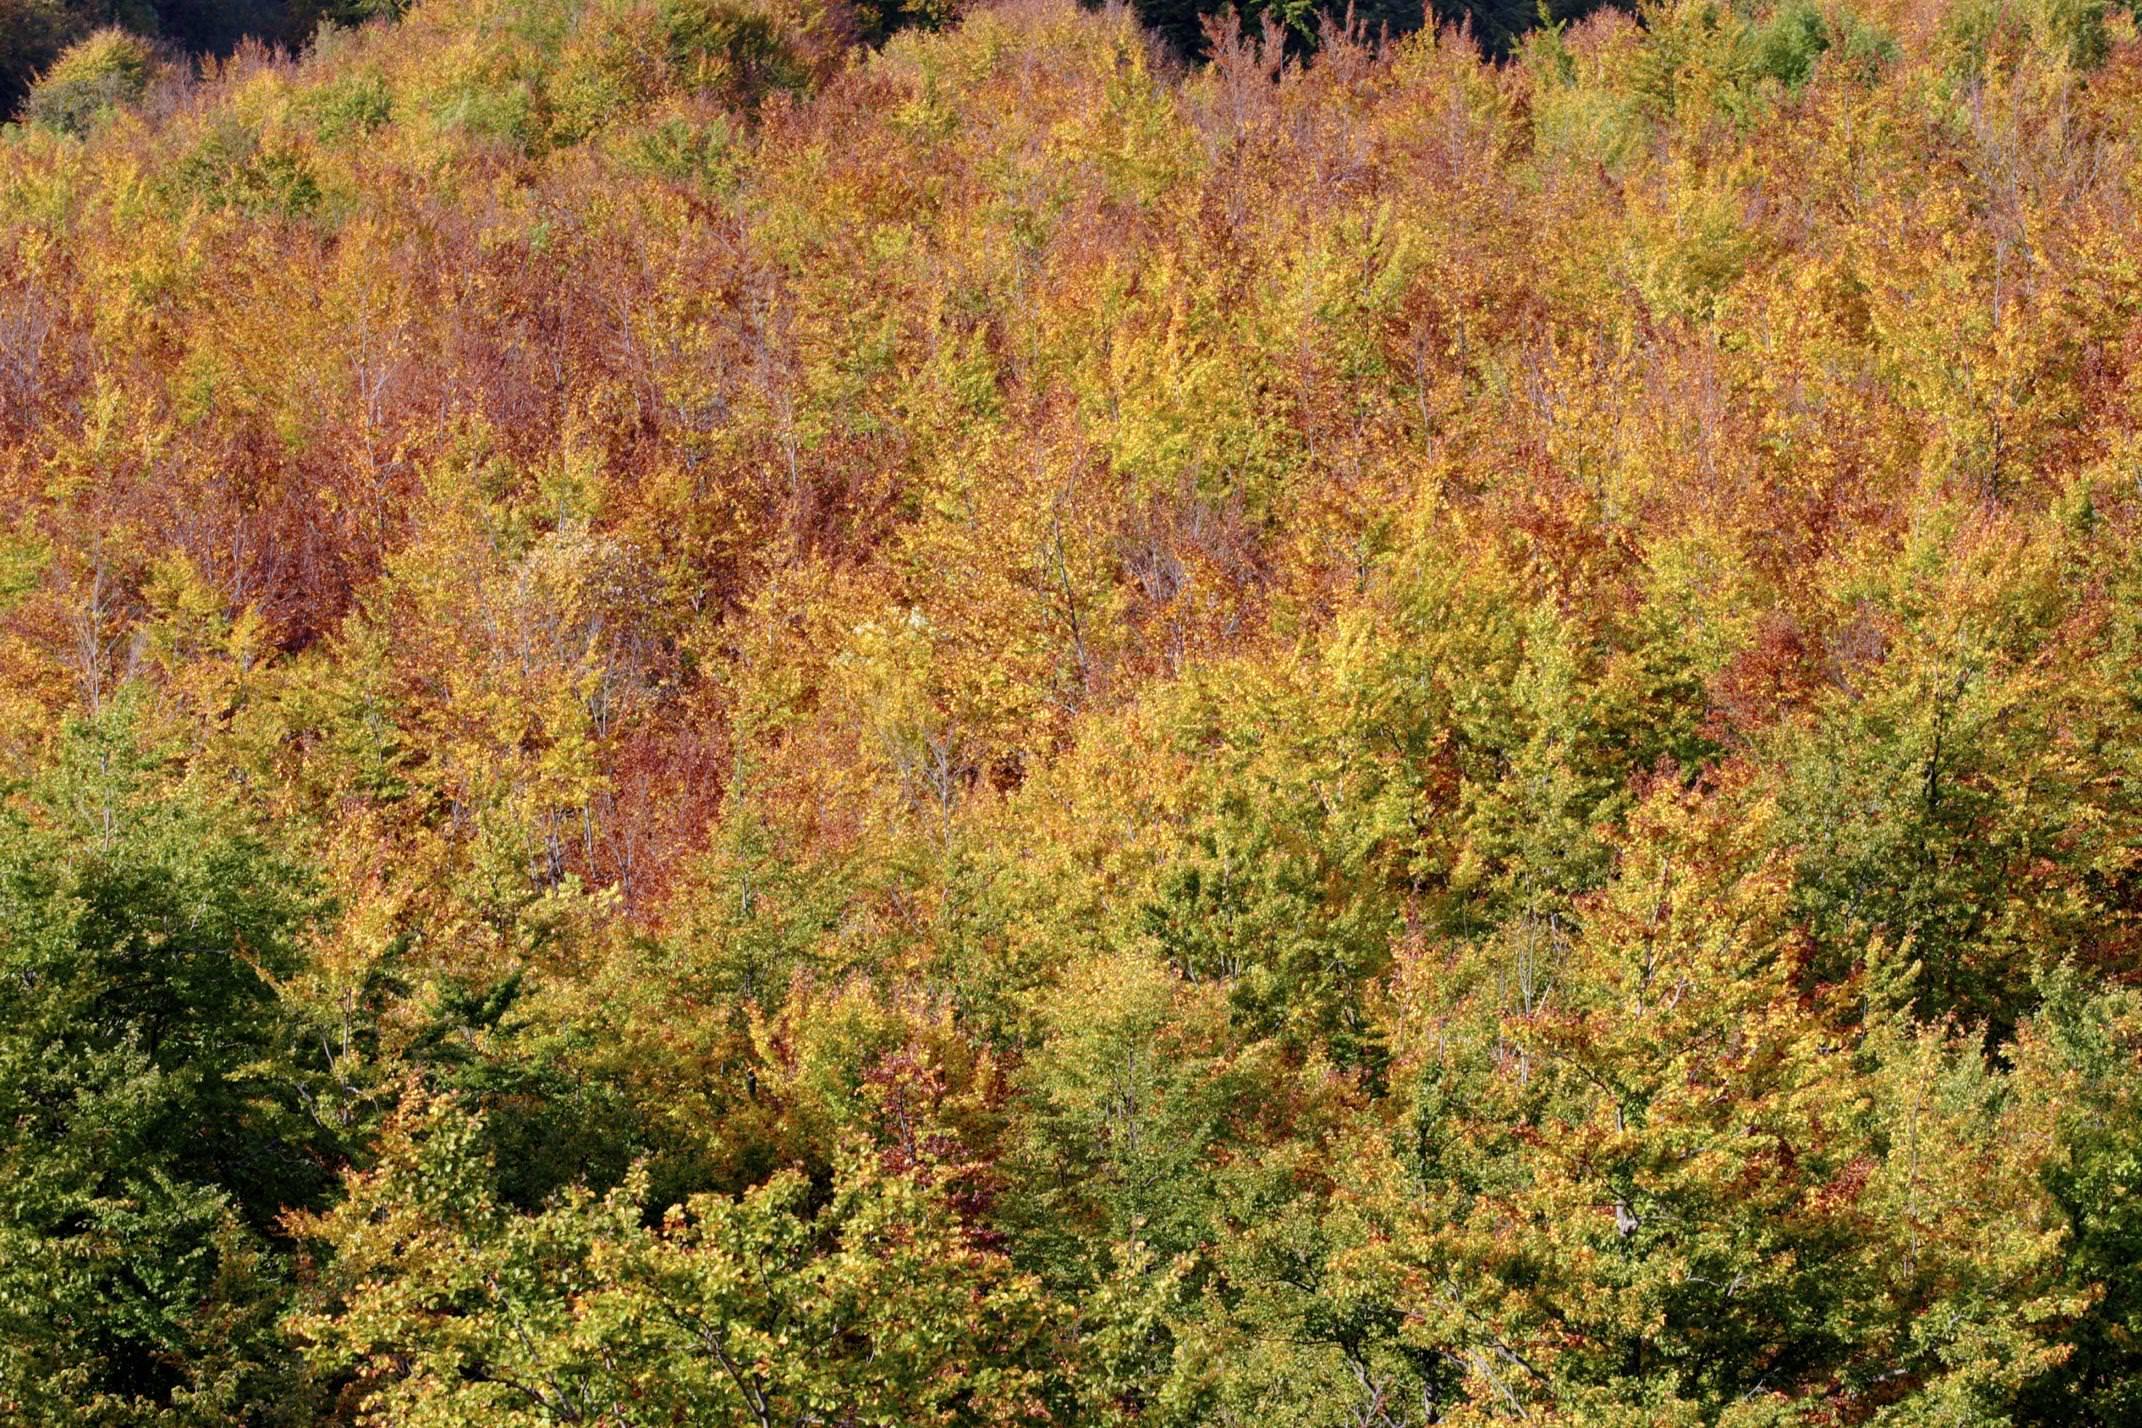 Spain picos de europa autumn trees close up